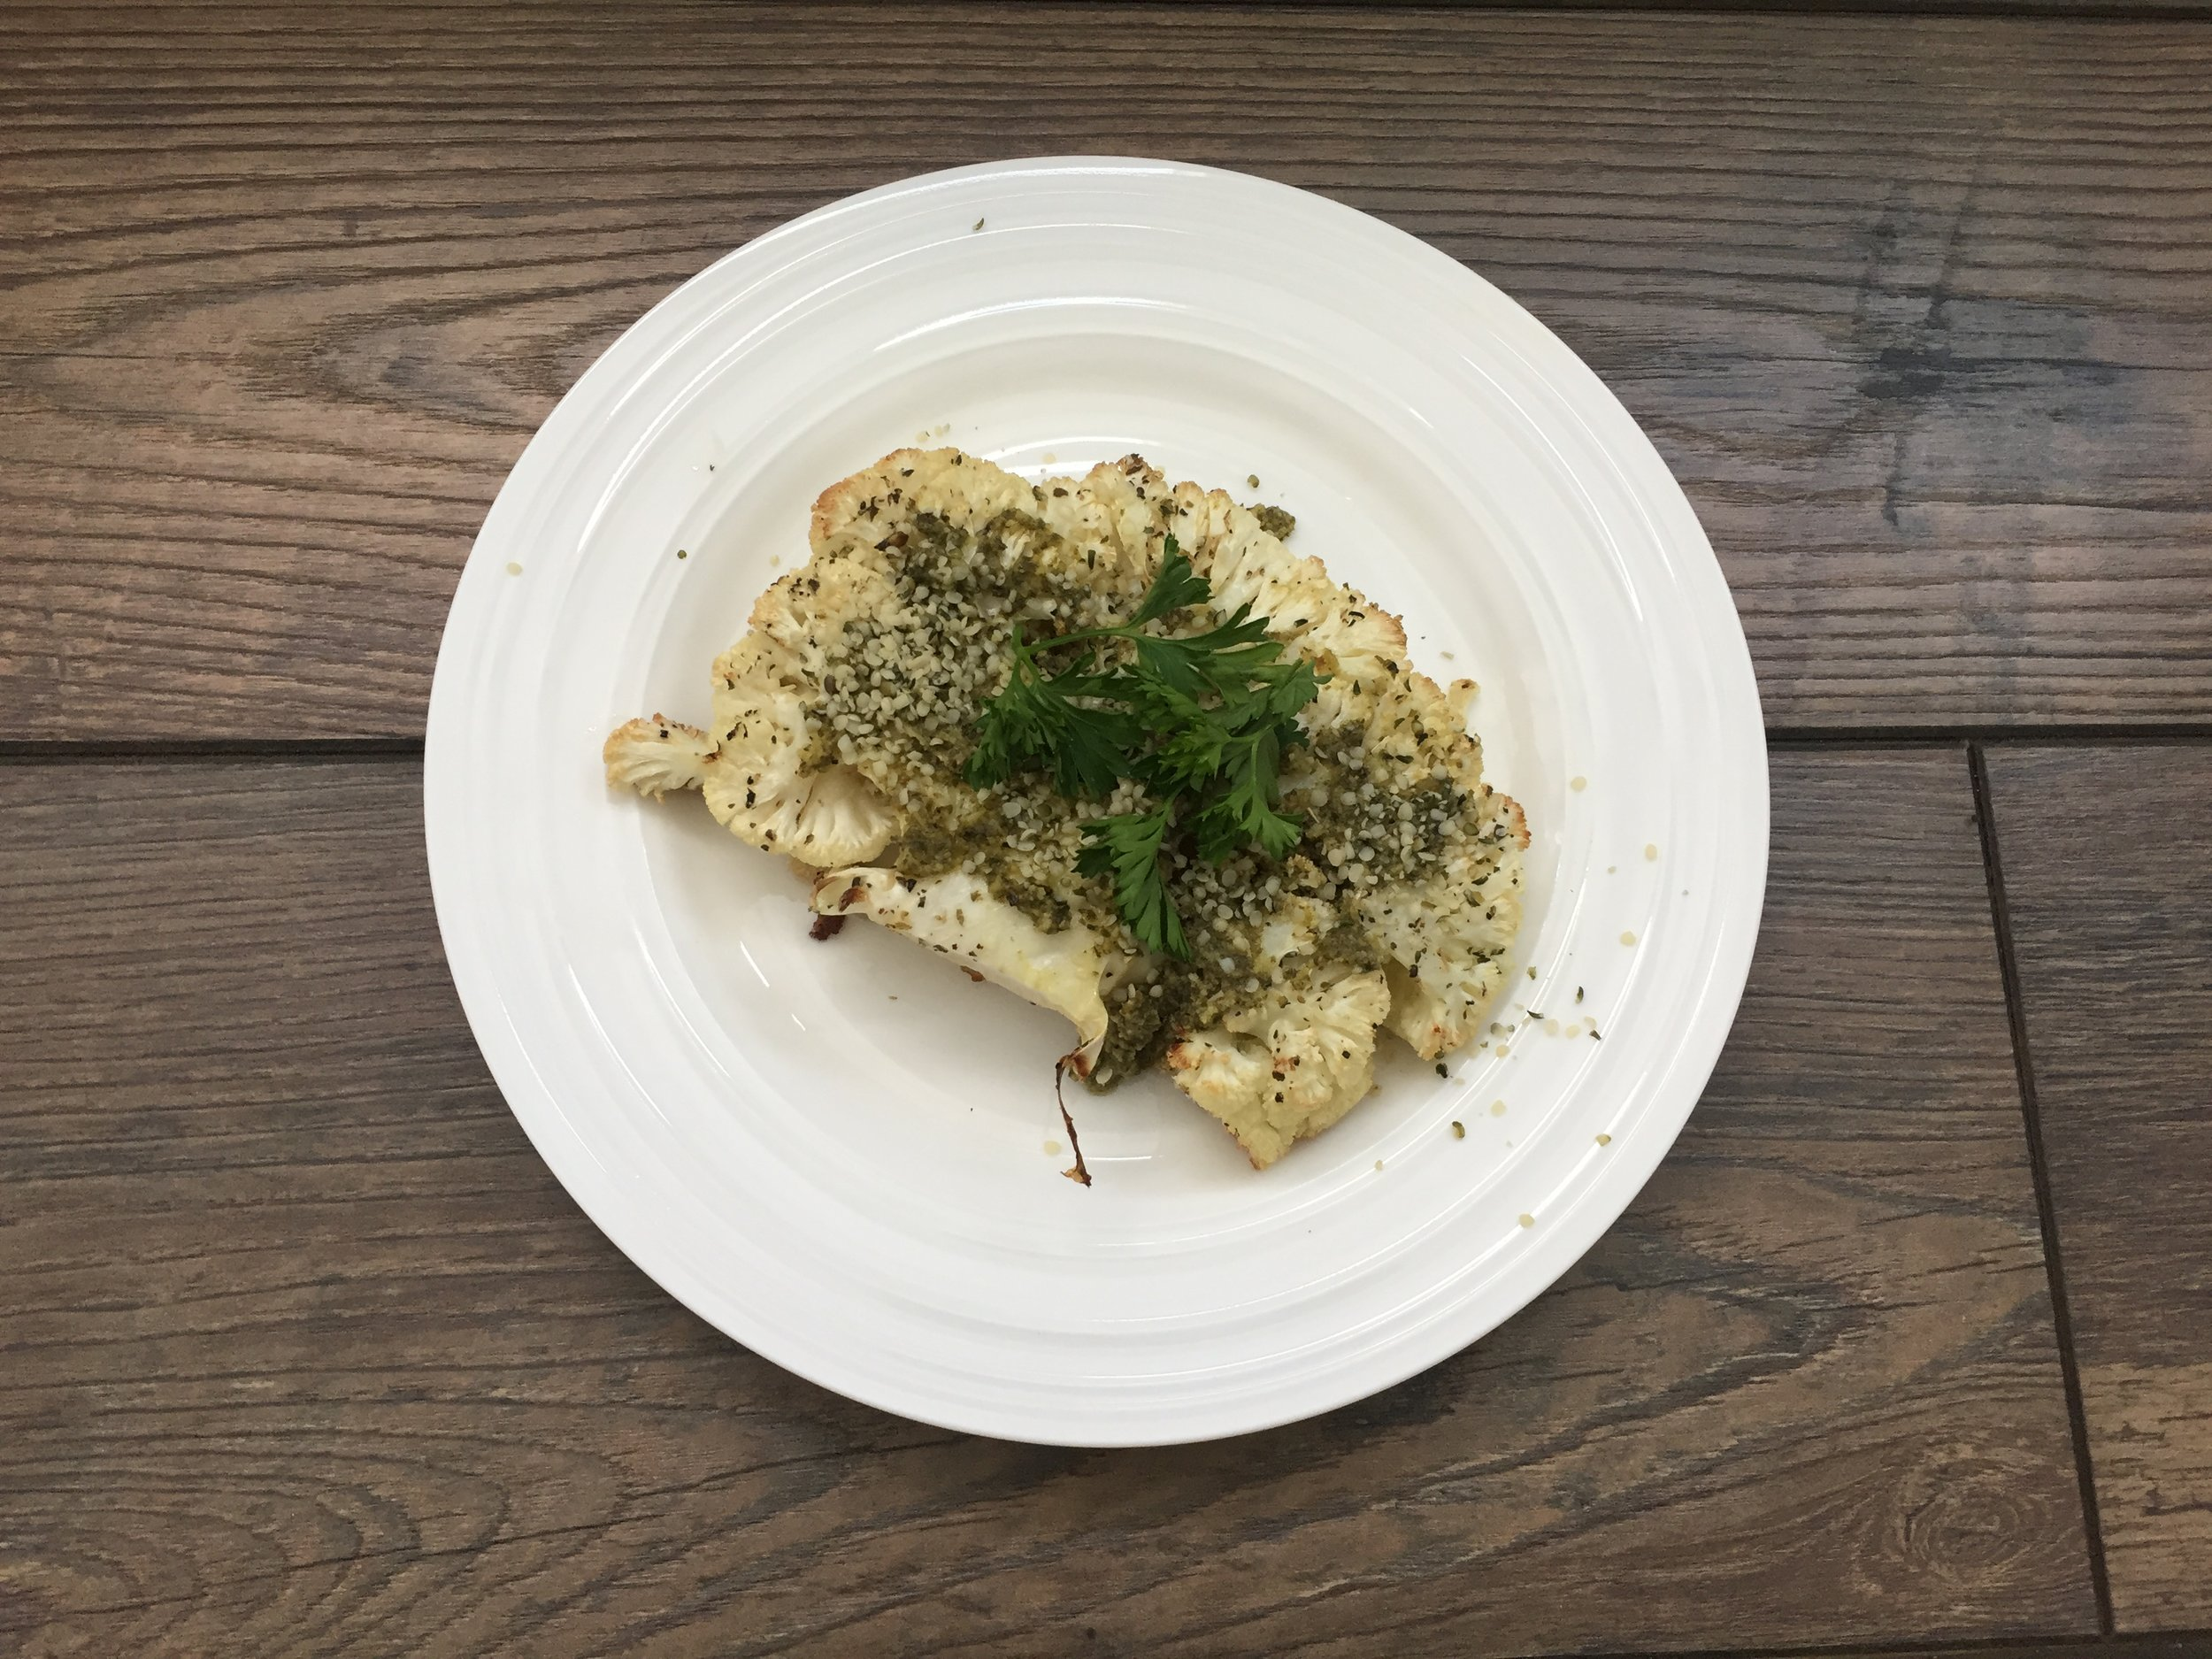 Cauliflower Steak with Pesto and Hemp Seeds